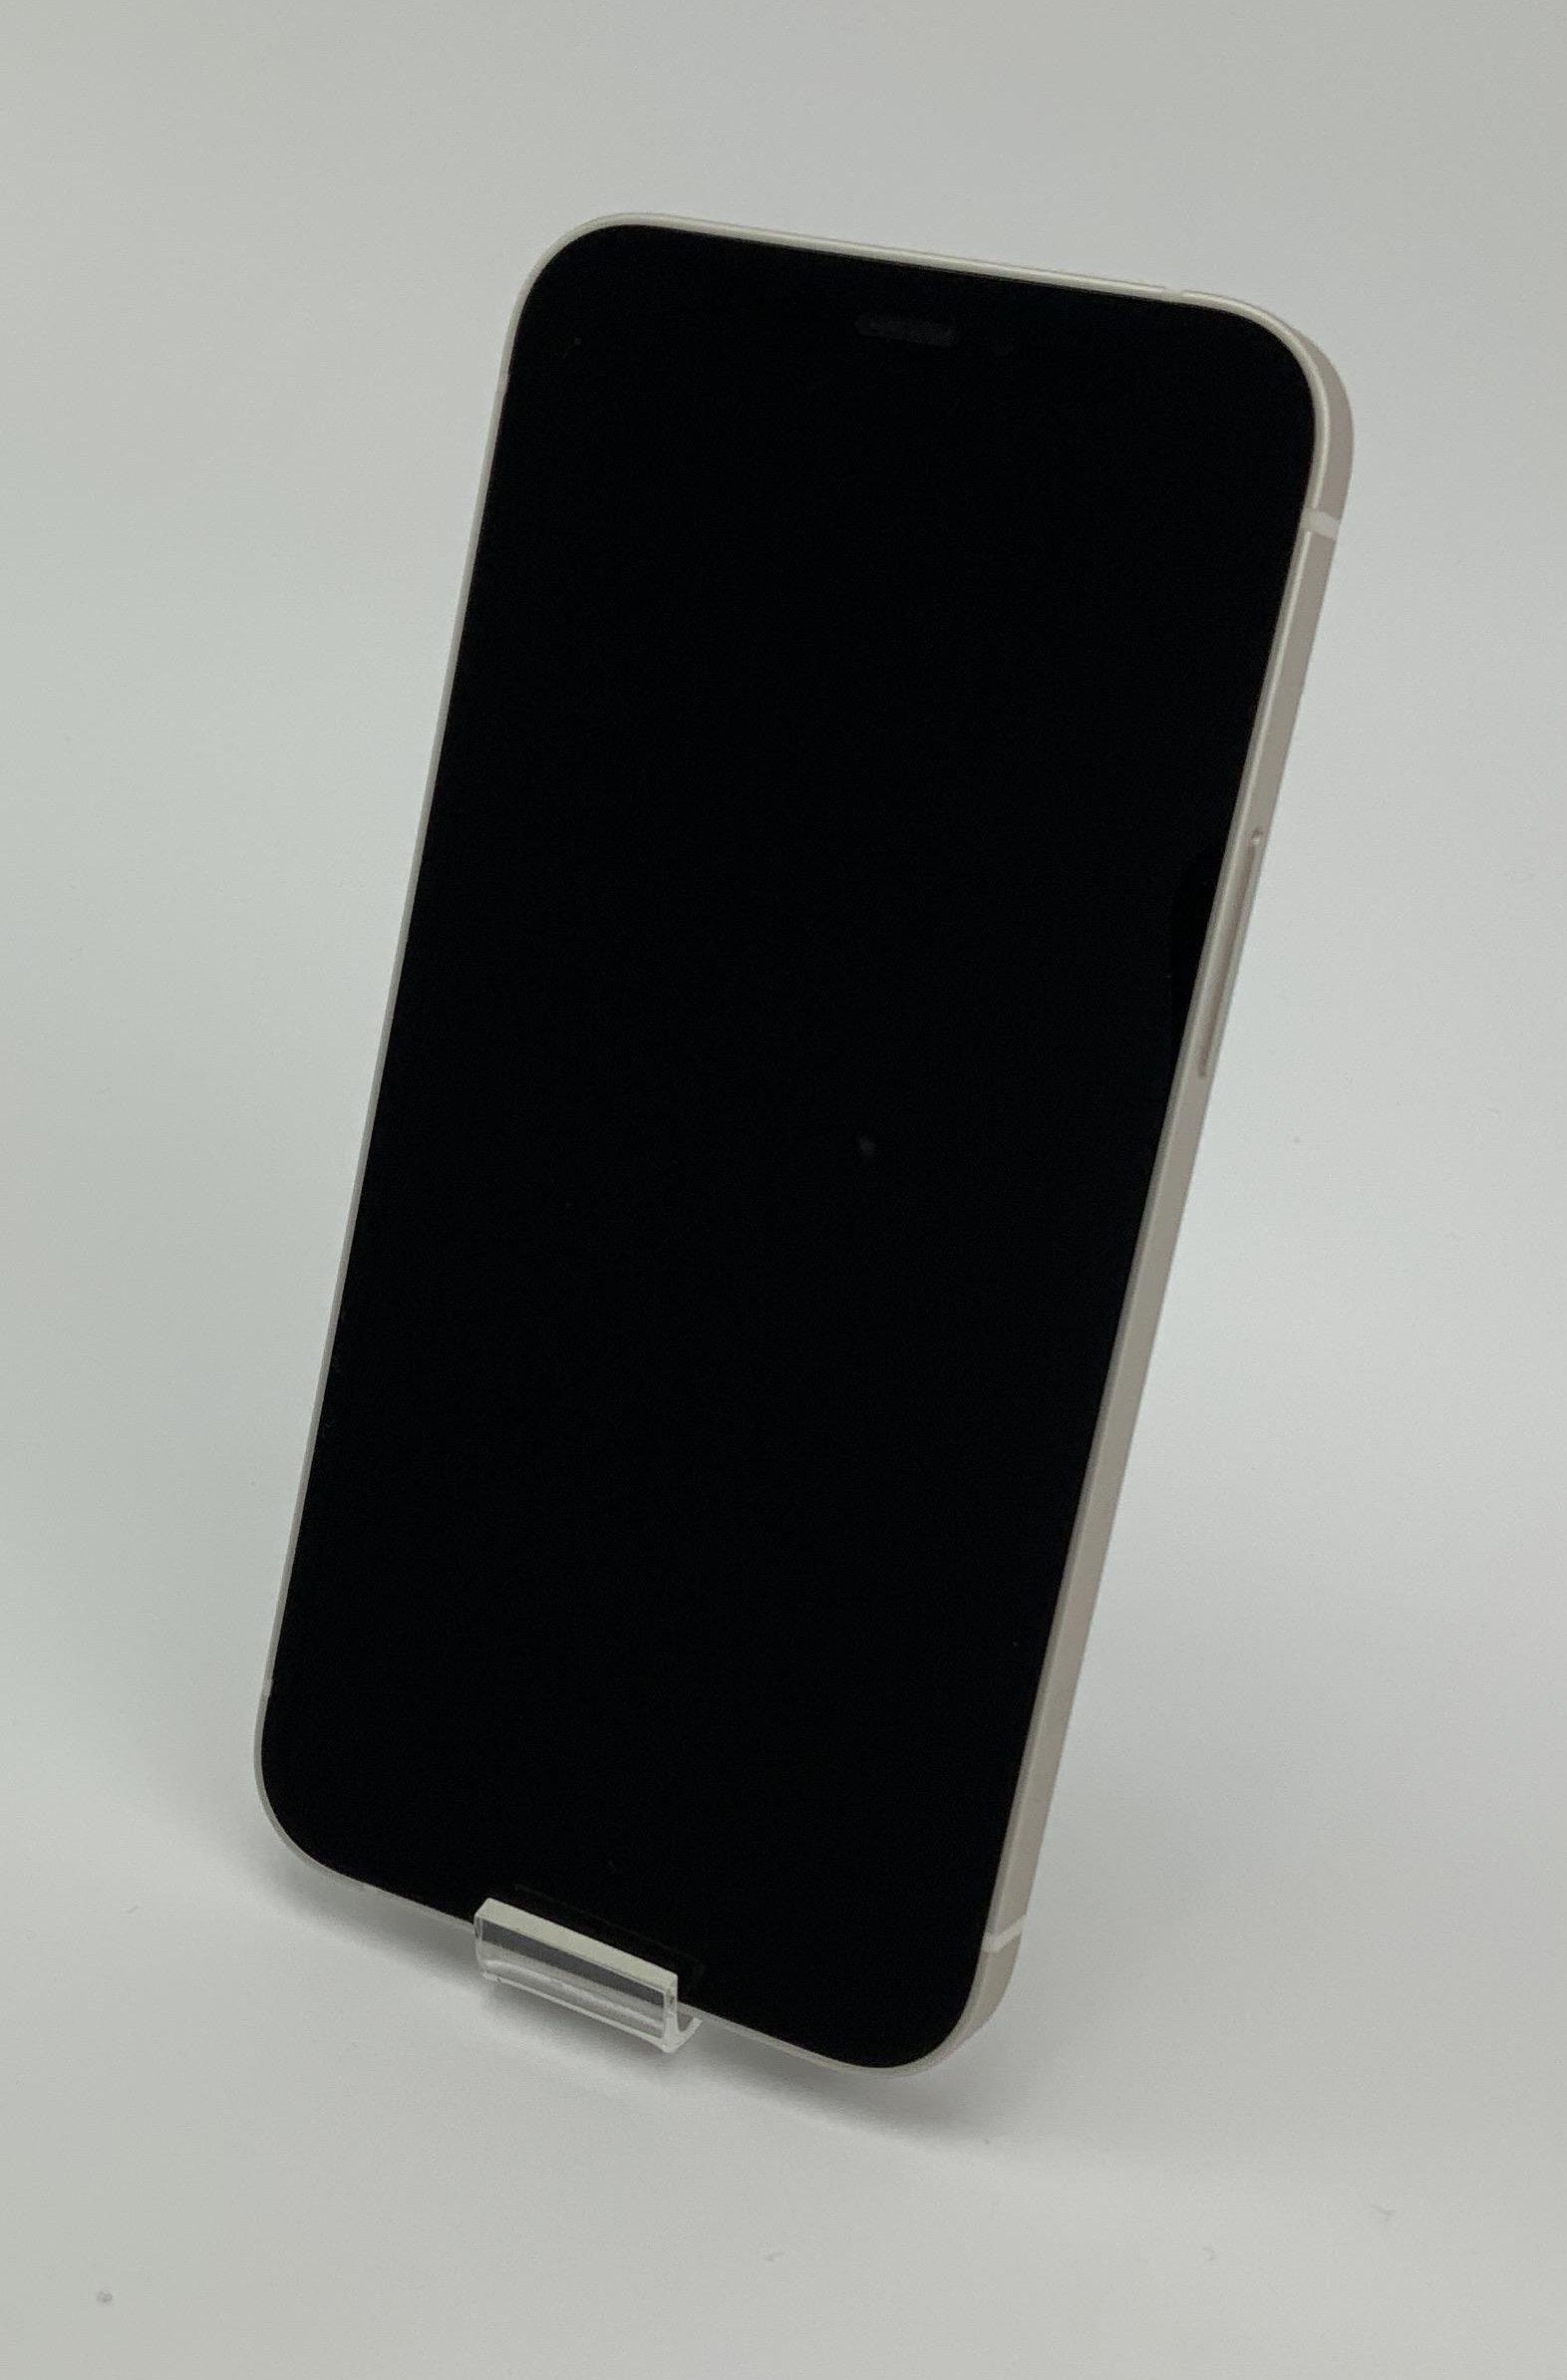 iPhone 12 Mini 128GB, 128GB, White, Afbeelding 1